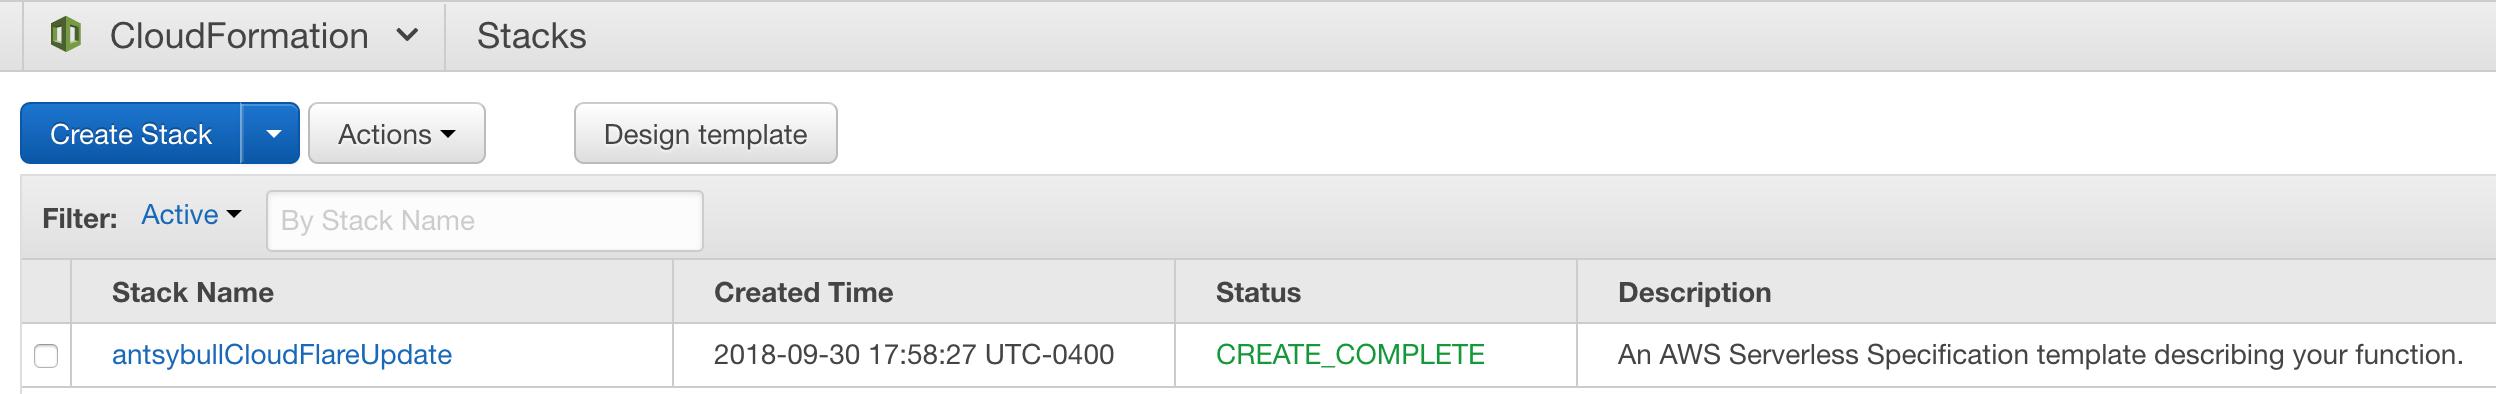 CloudFormation Success Screenshot